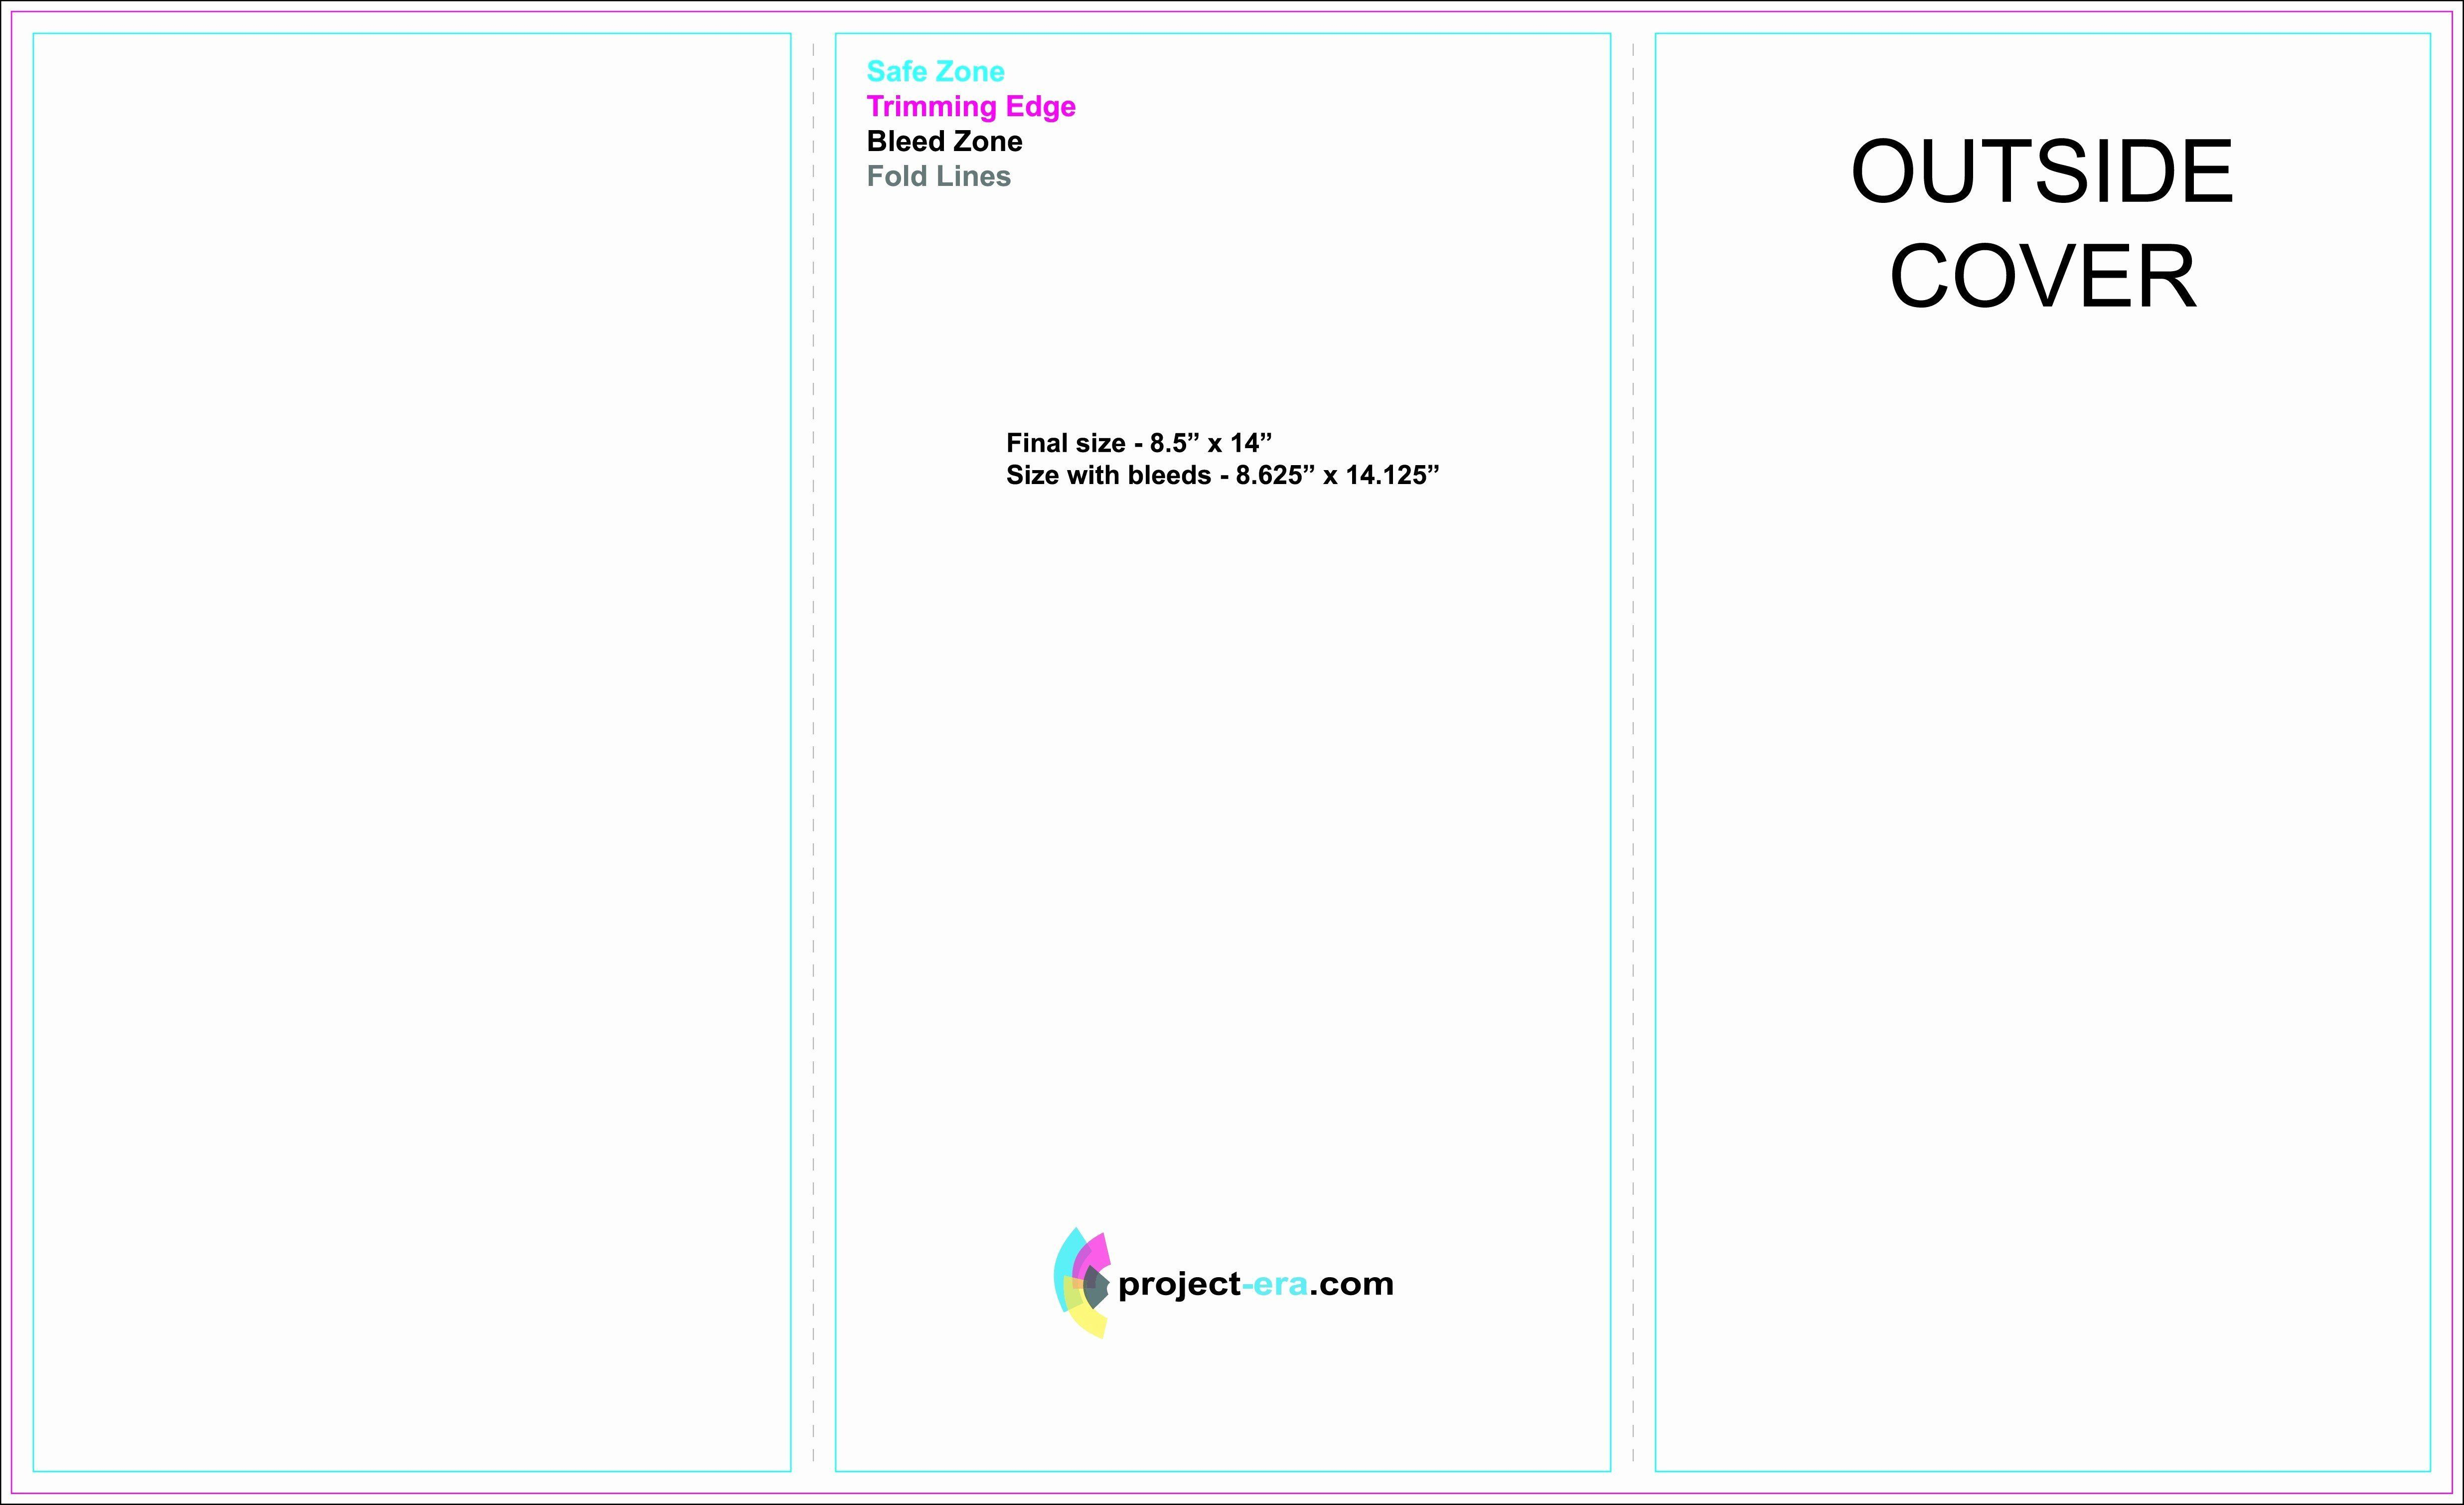 002 Simple Tri Fold Template Google Doc Sample  Docs Brochure Free Pamphlet Blank SlideFull